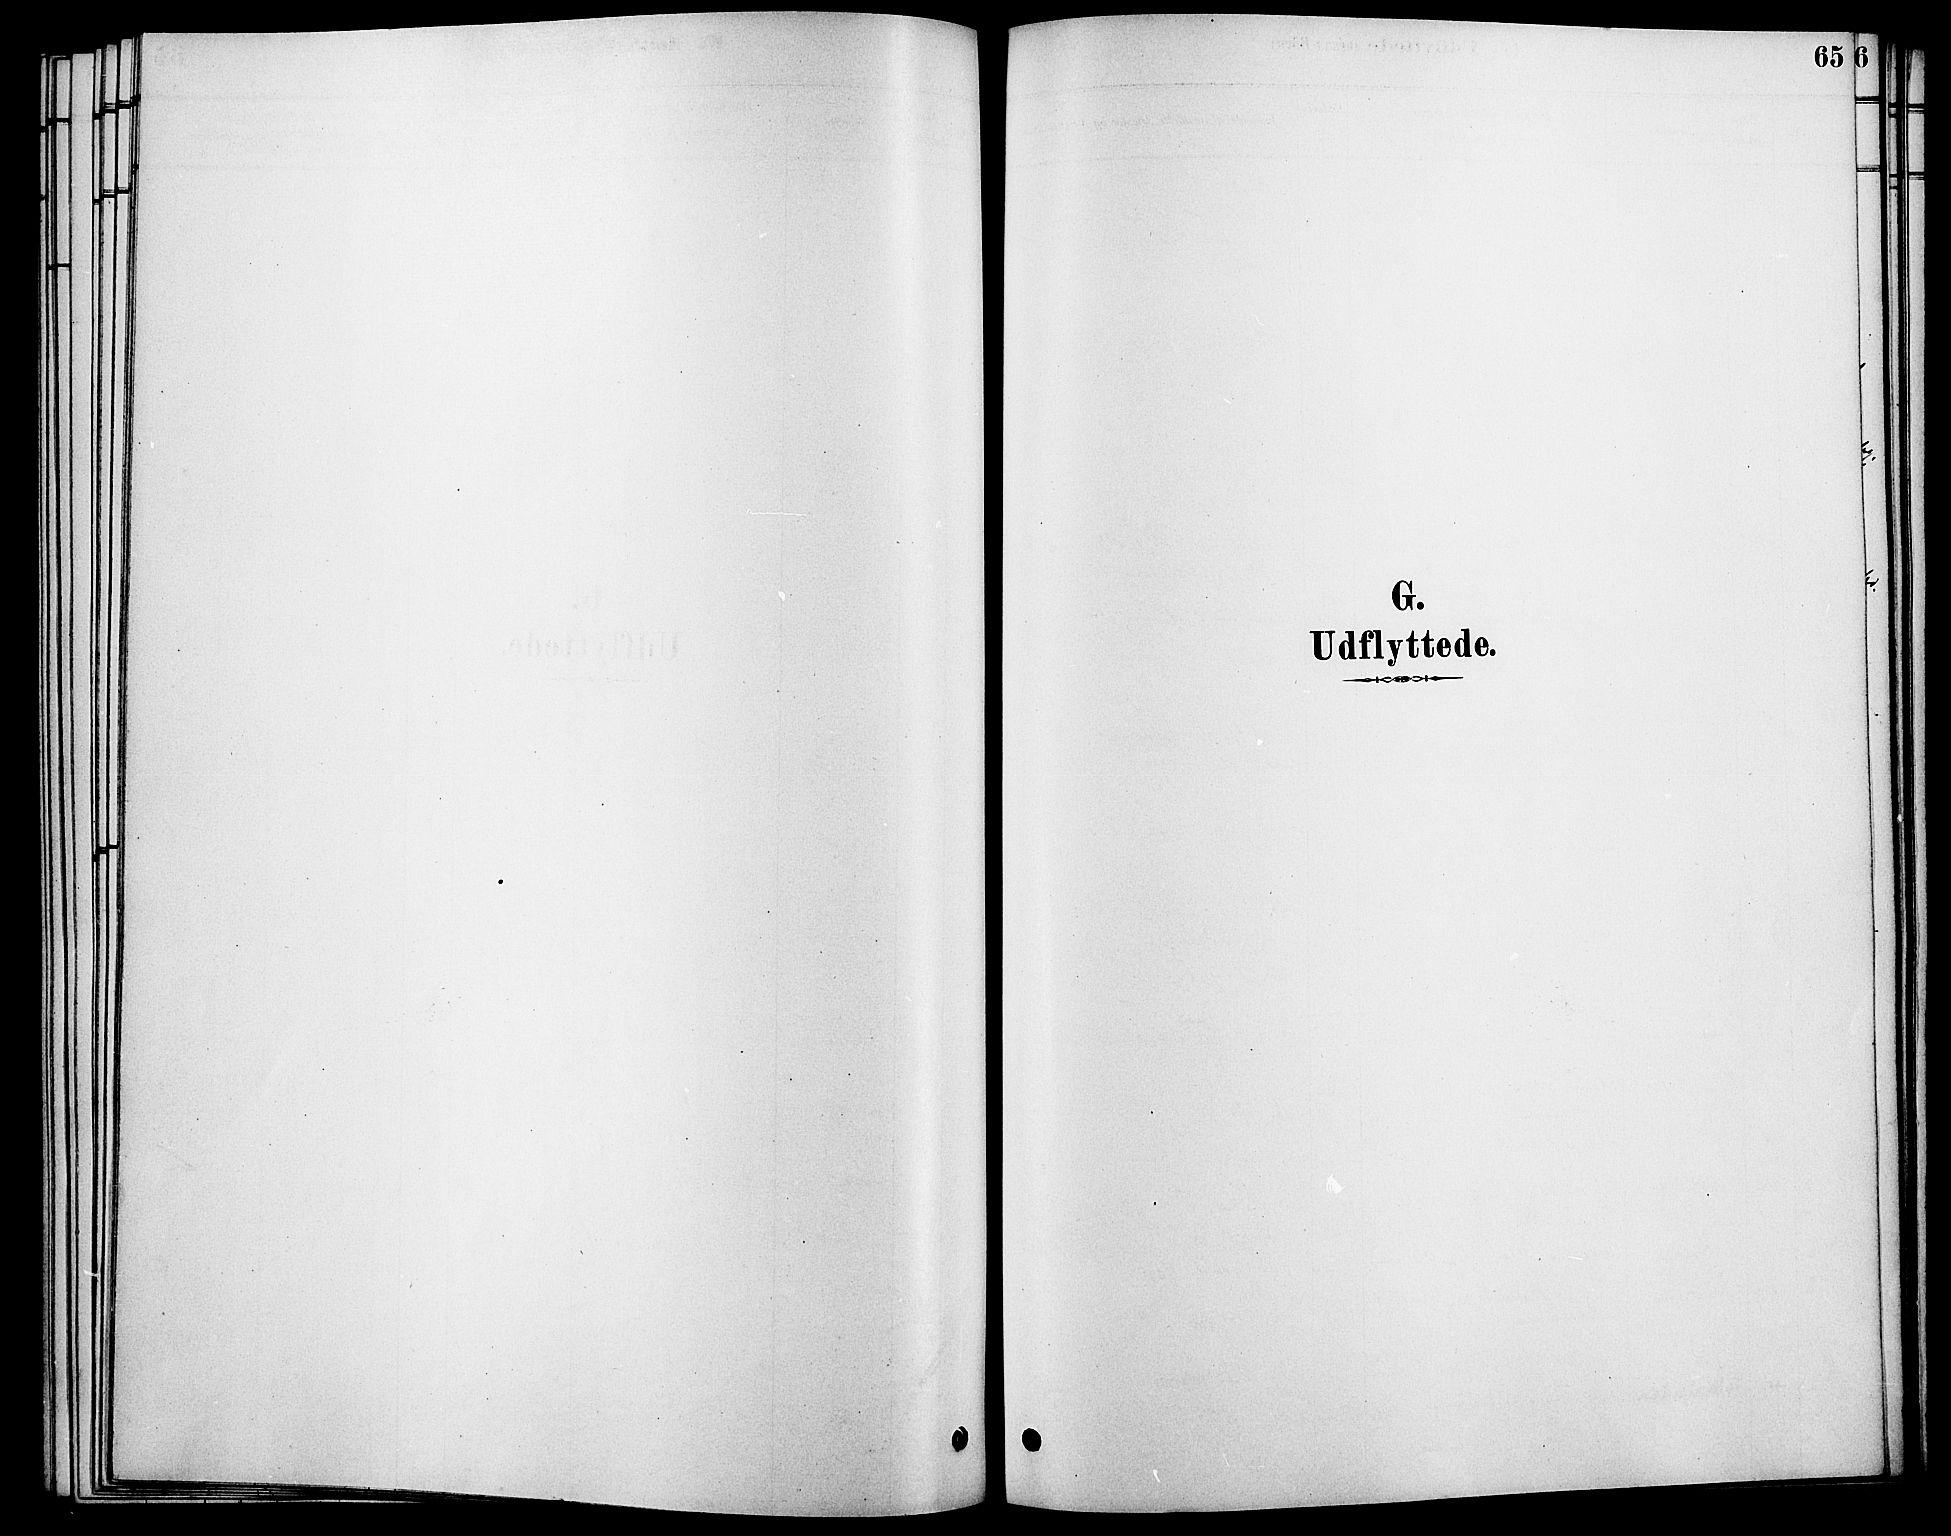 SAH, Rendalen prestekontor, H/Ha/Haa/L0007: Ministerialbok nr. 7, 1878-1898, s. 65